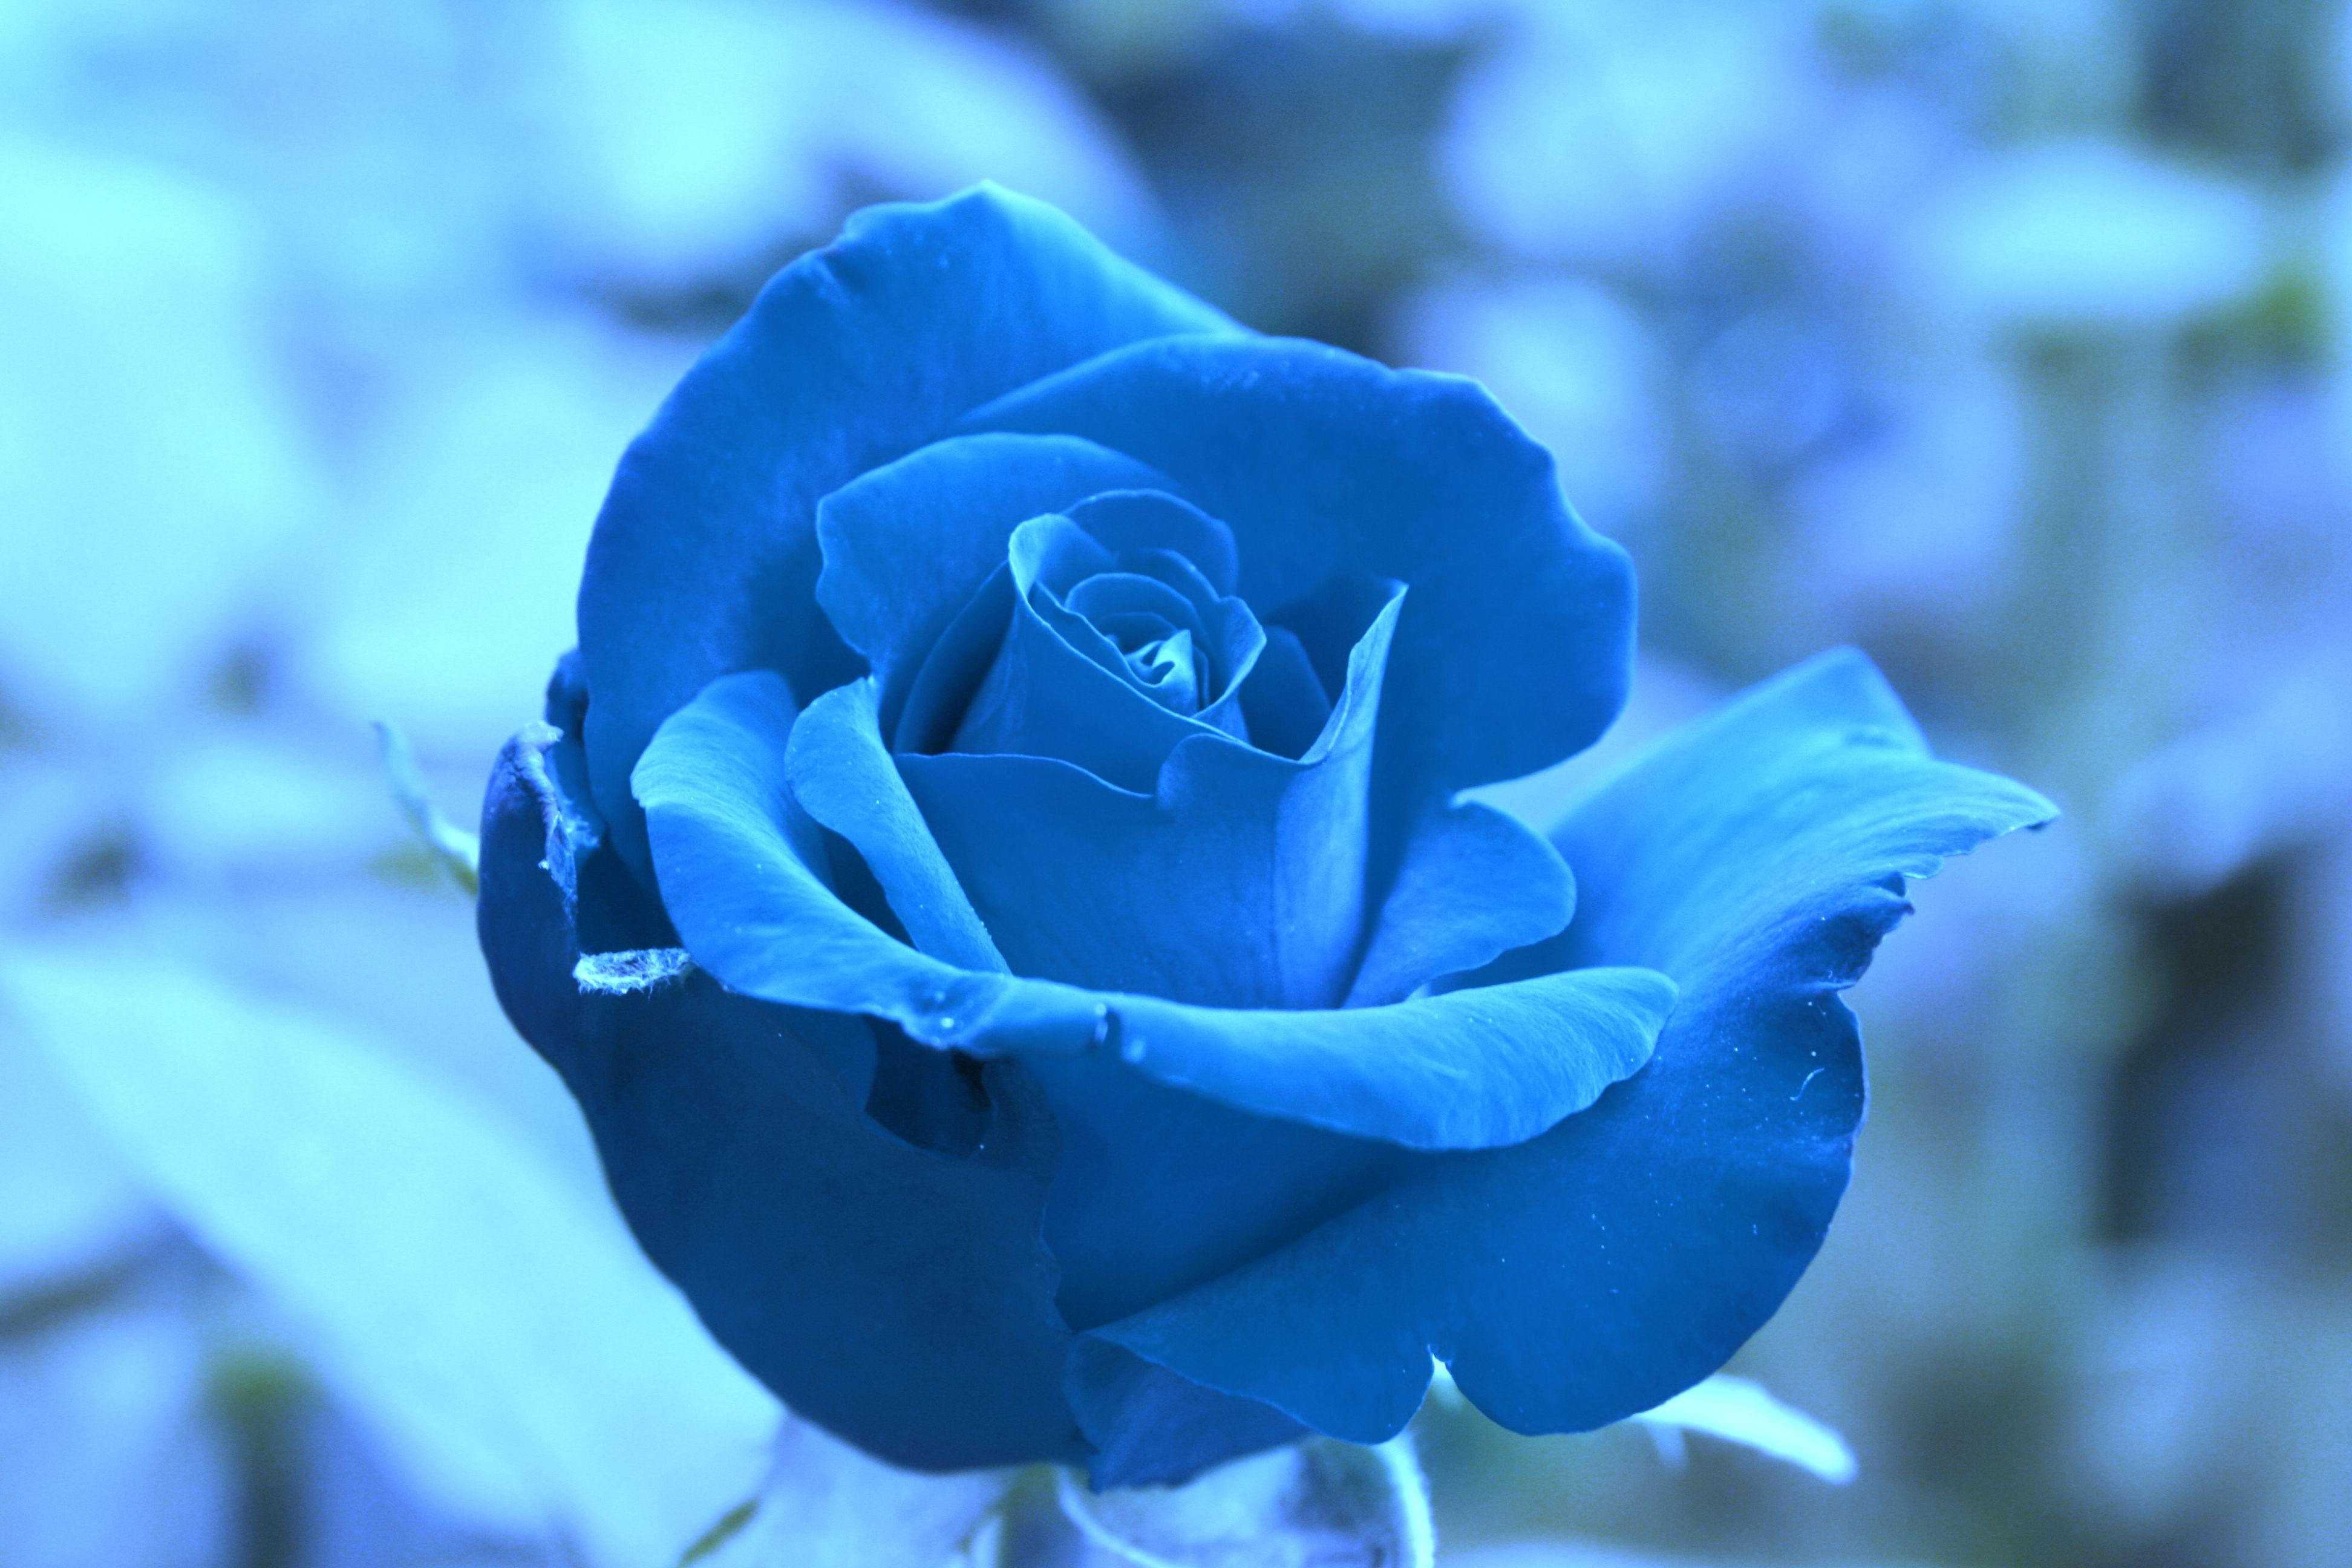 Beautiful Blue Roses | ... Blue rose ♥, beautiful, blue, flower ...